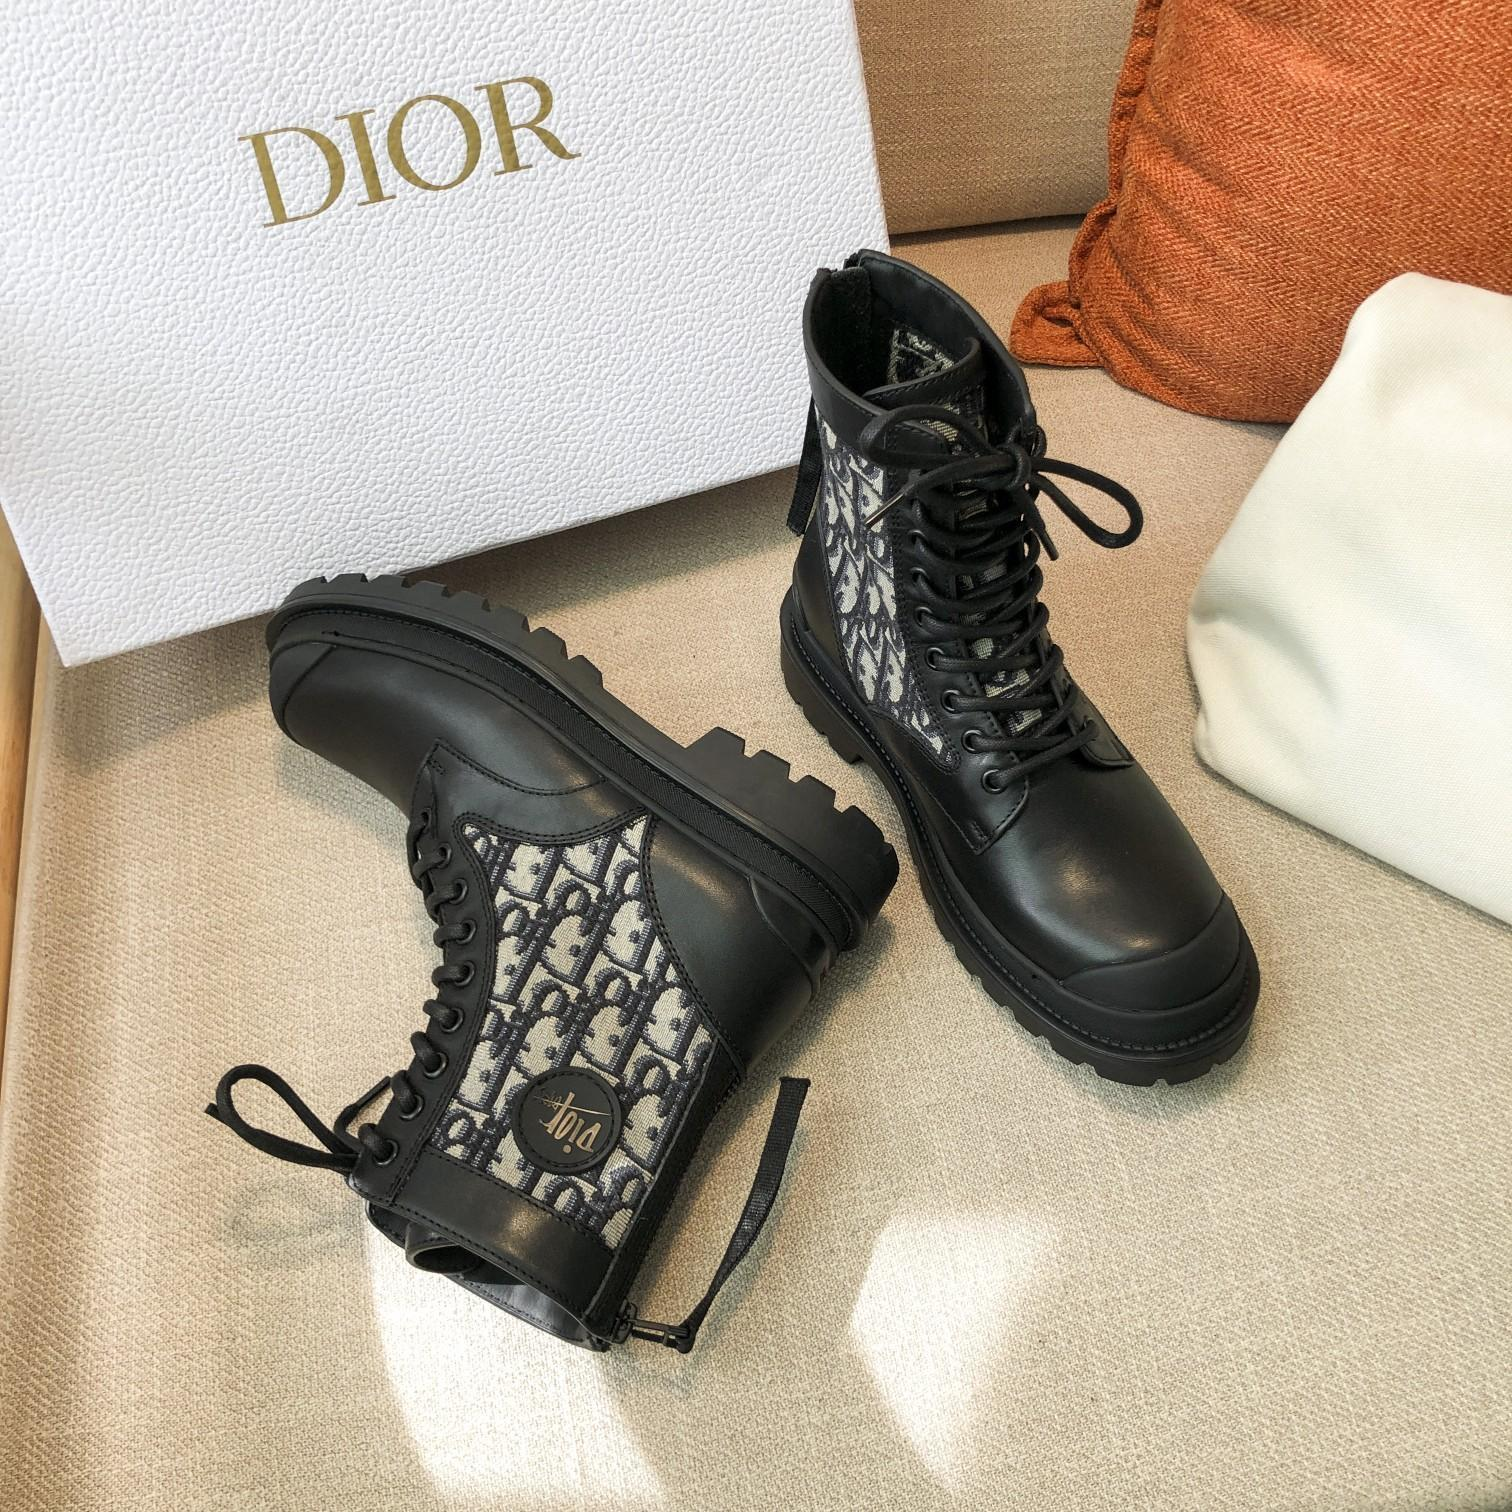 Dior高版本情侣 款2020ss秋冬新款字母厚底系带机车靴,秋冬T台走秀同款(图5)